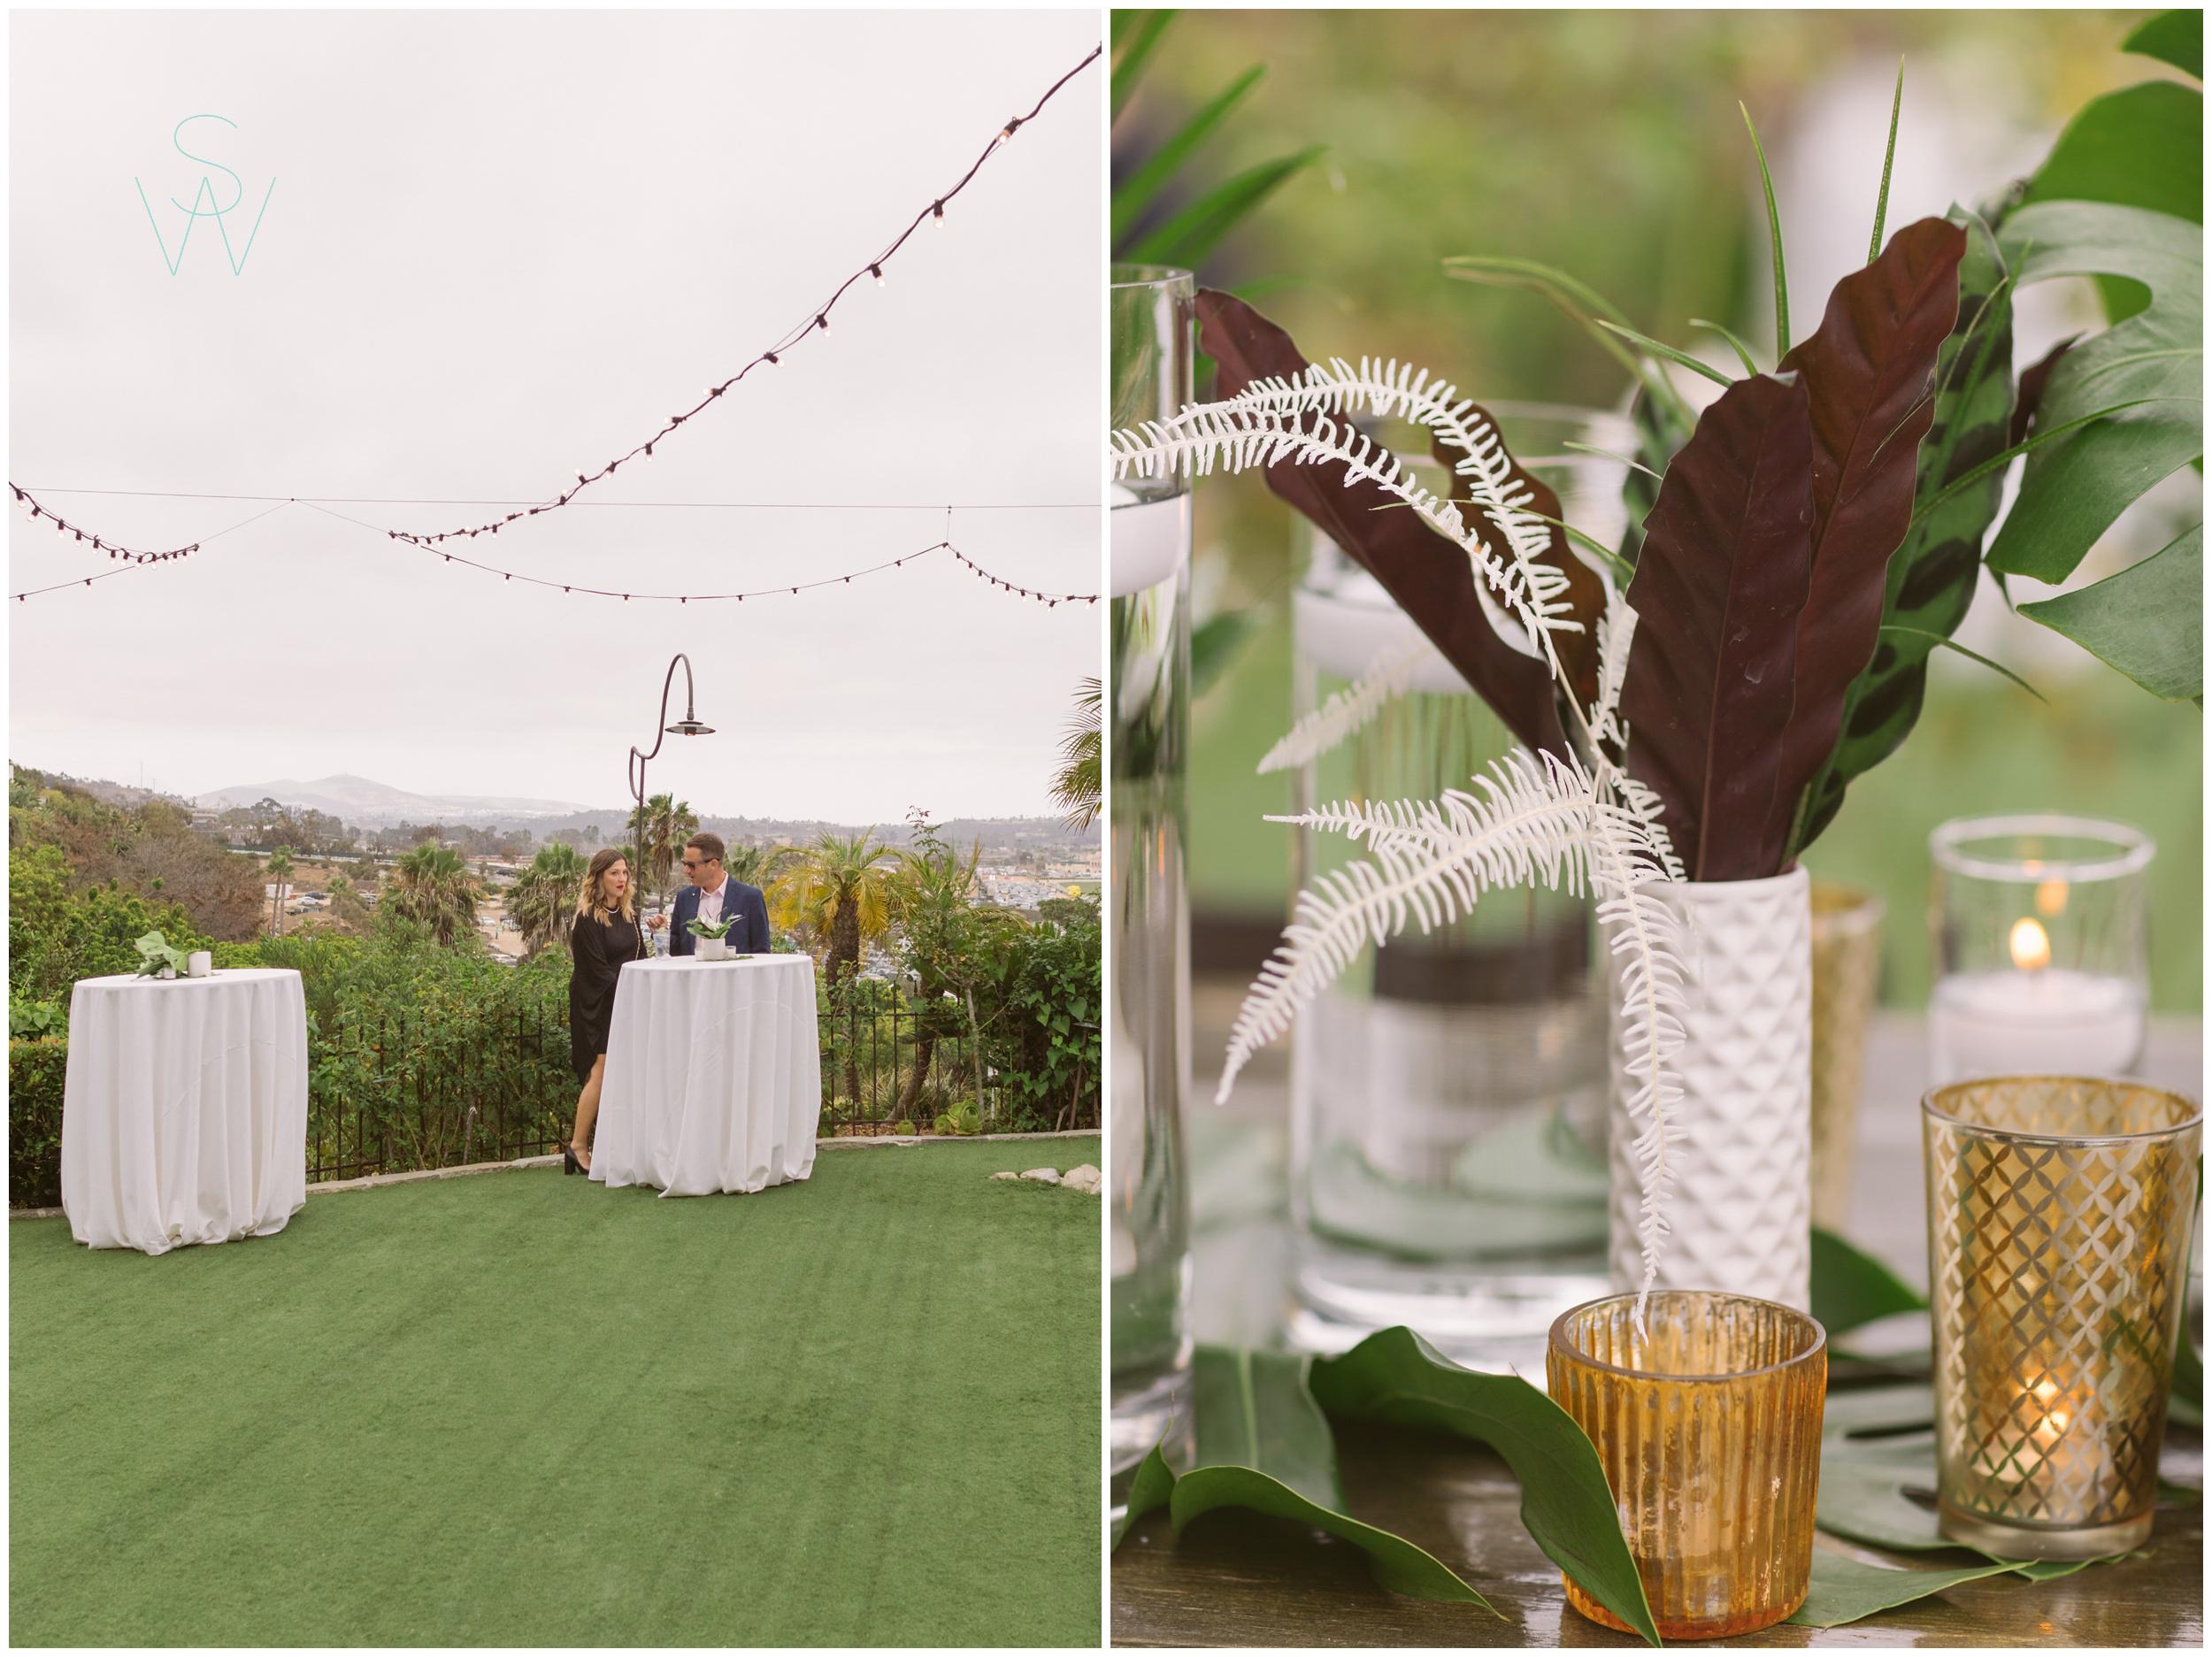 shewanders.san.diego.wedding.brigatine.isari-160.jpg